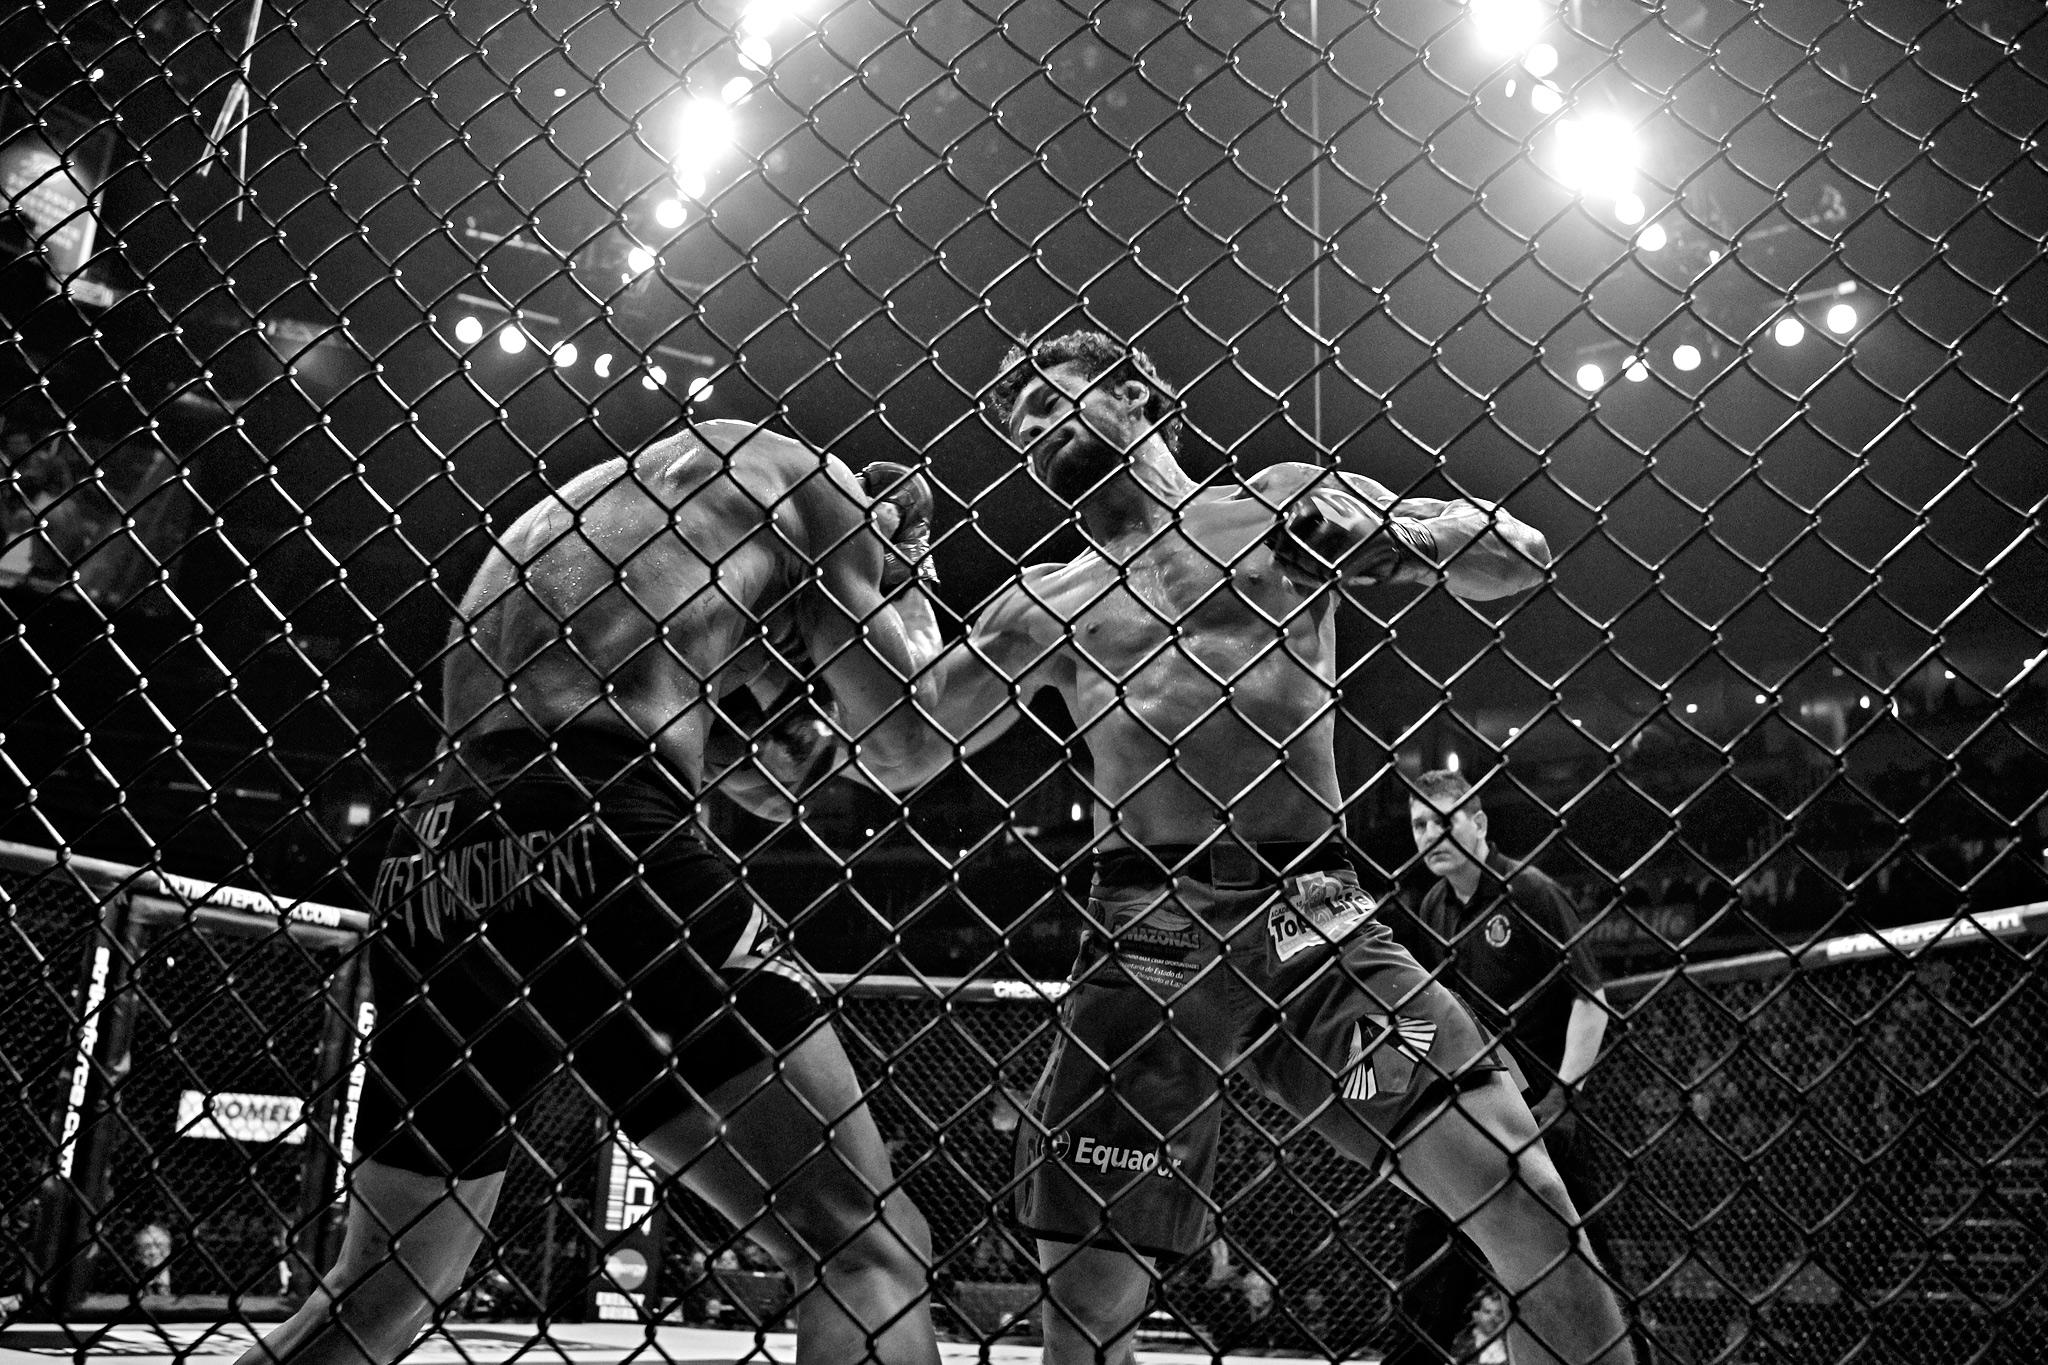 Jorge Gurgel vs. Adriano Martins